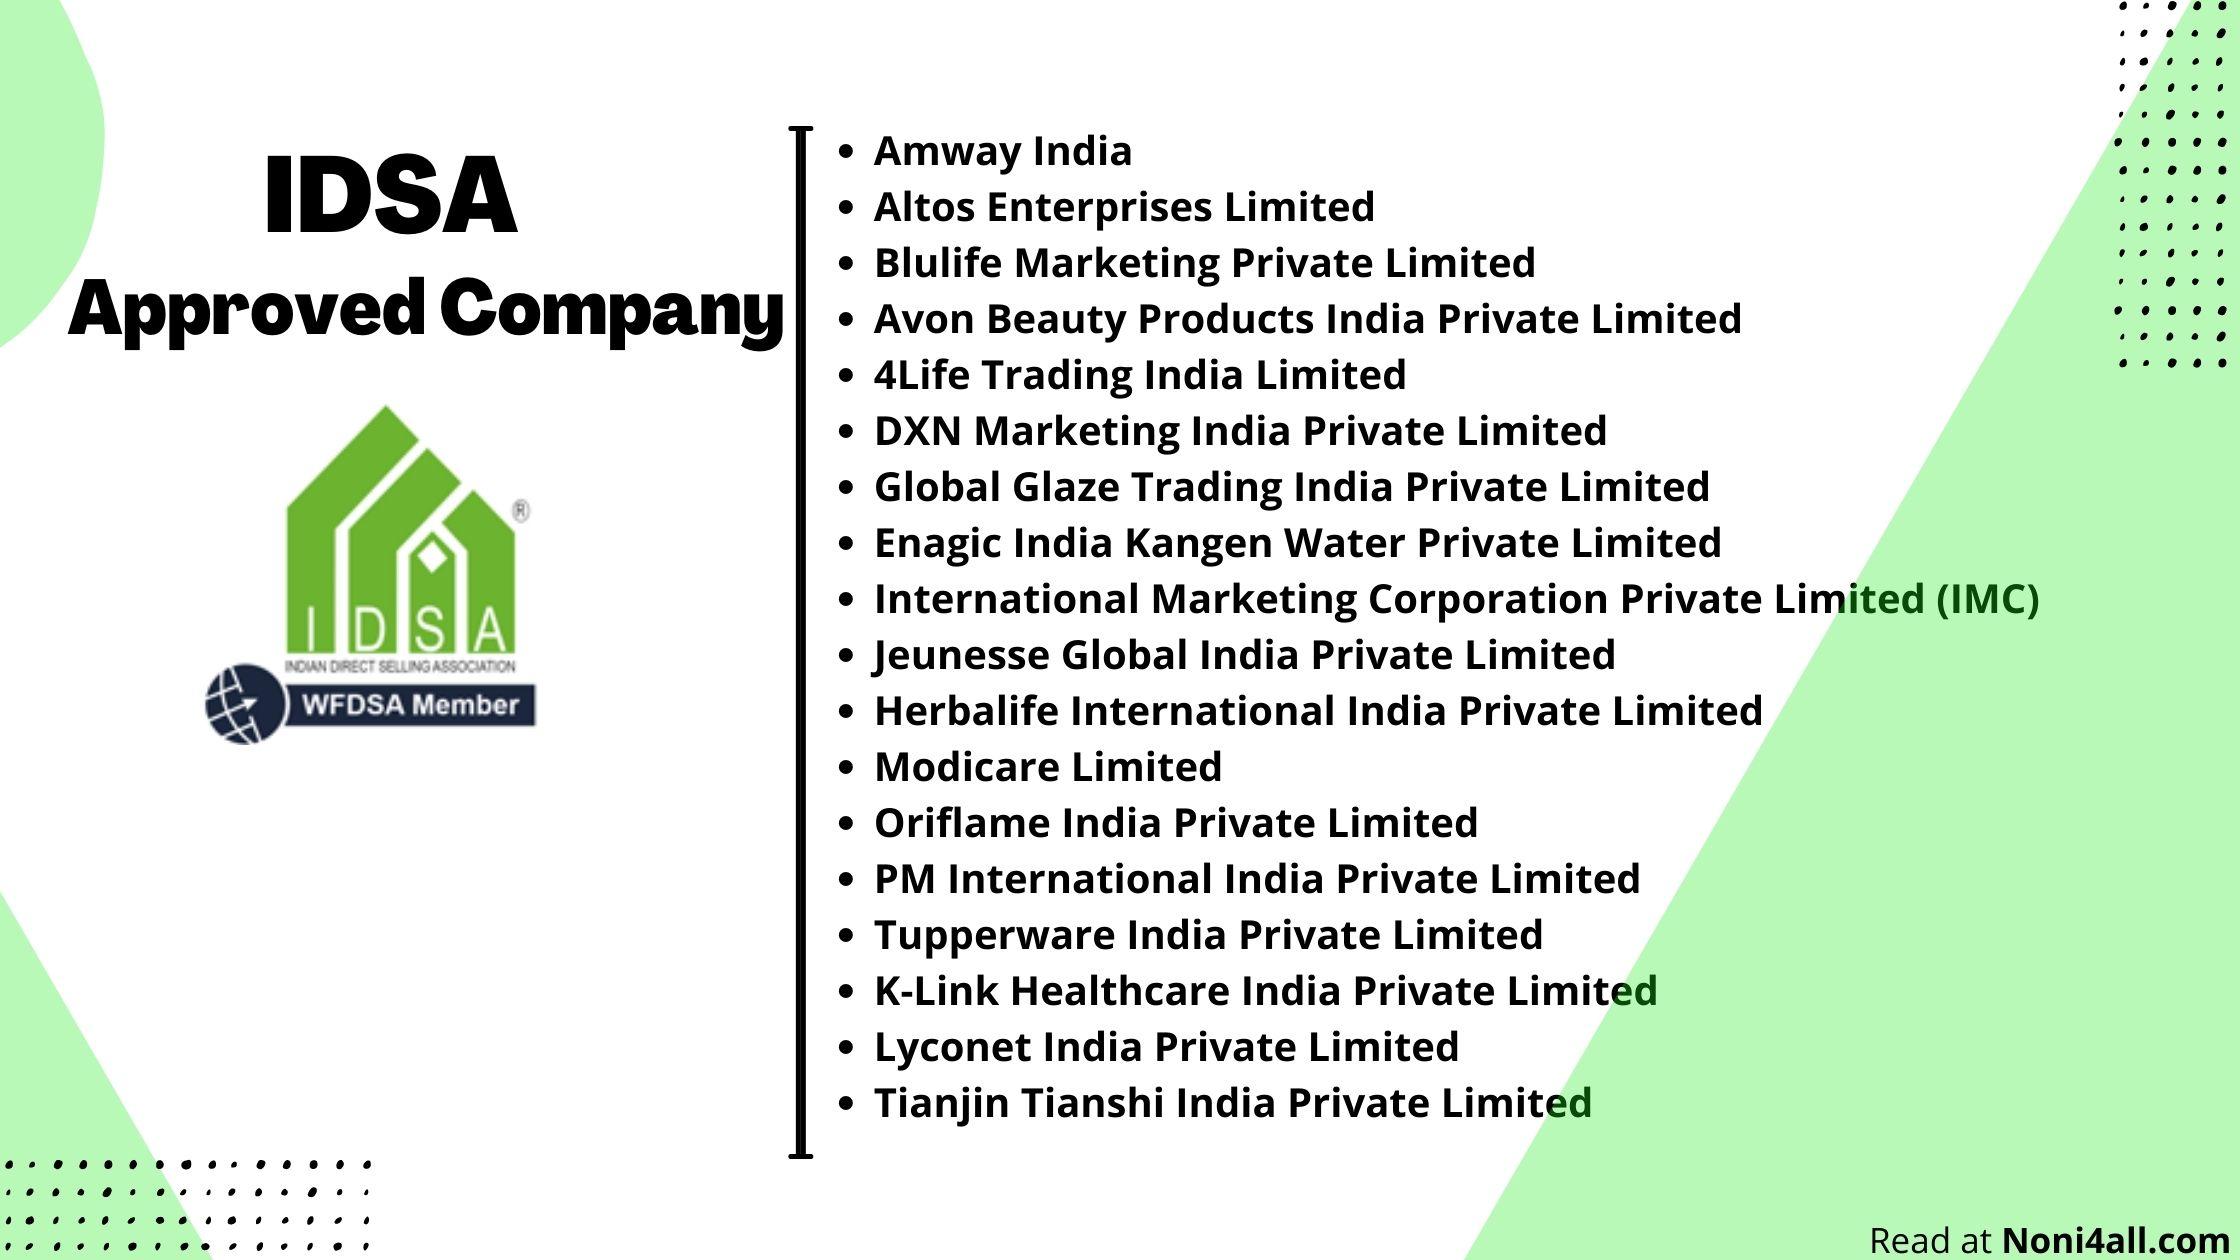 idsa company list